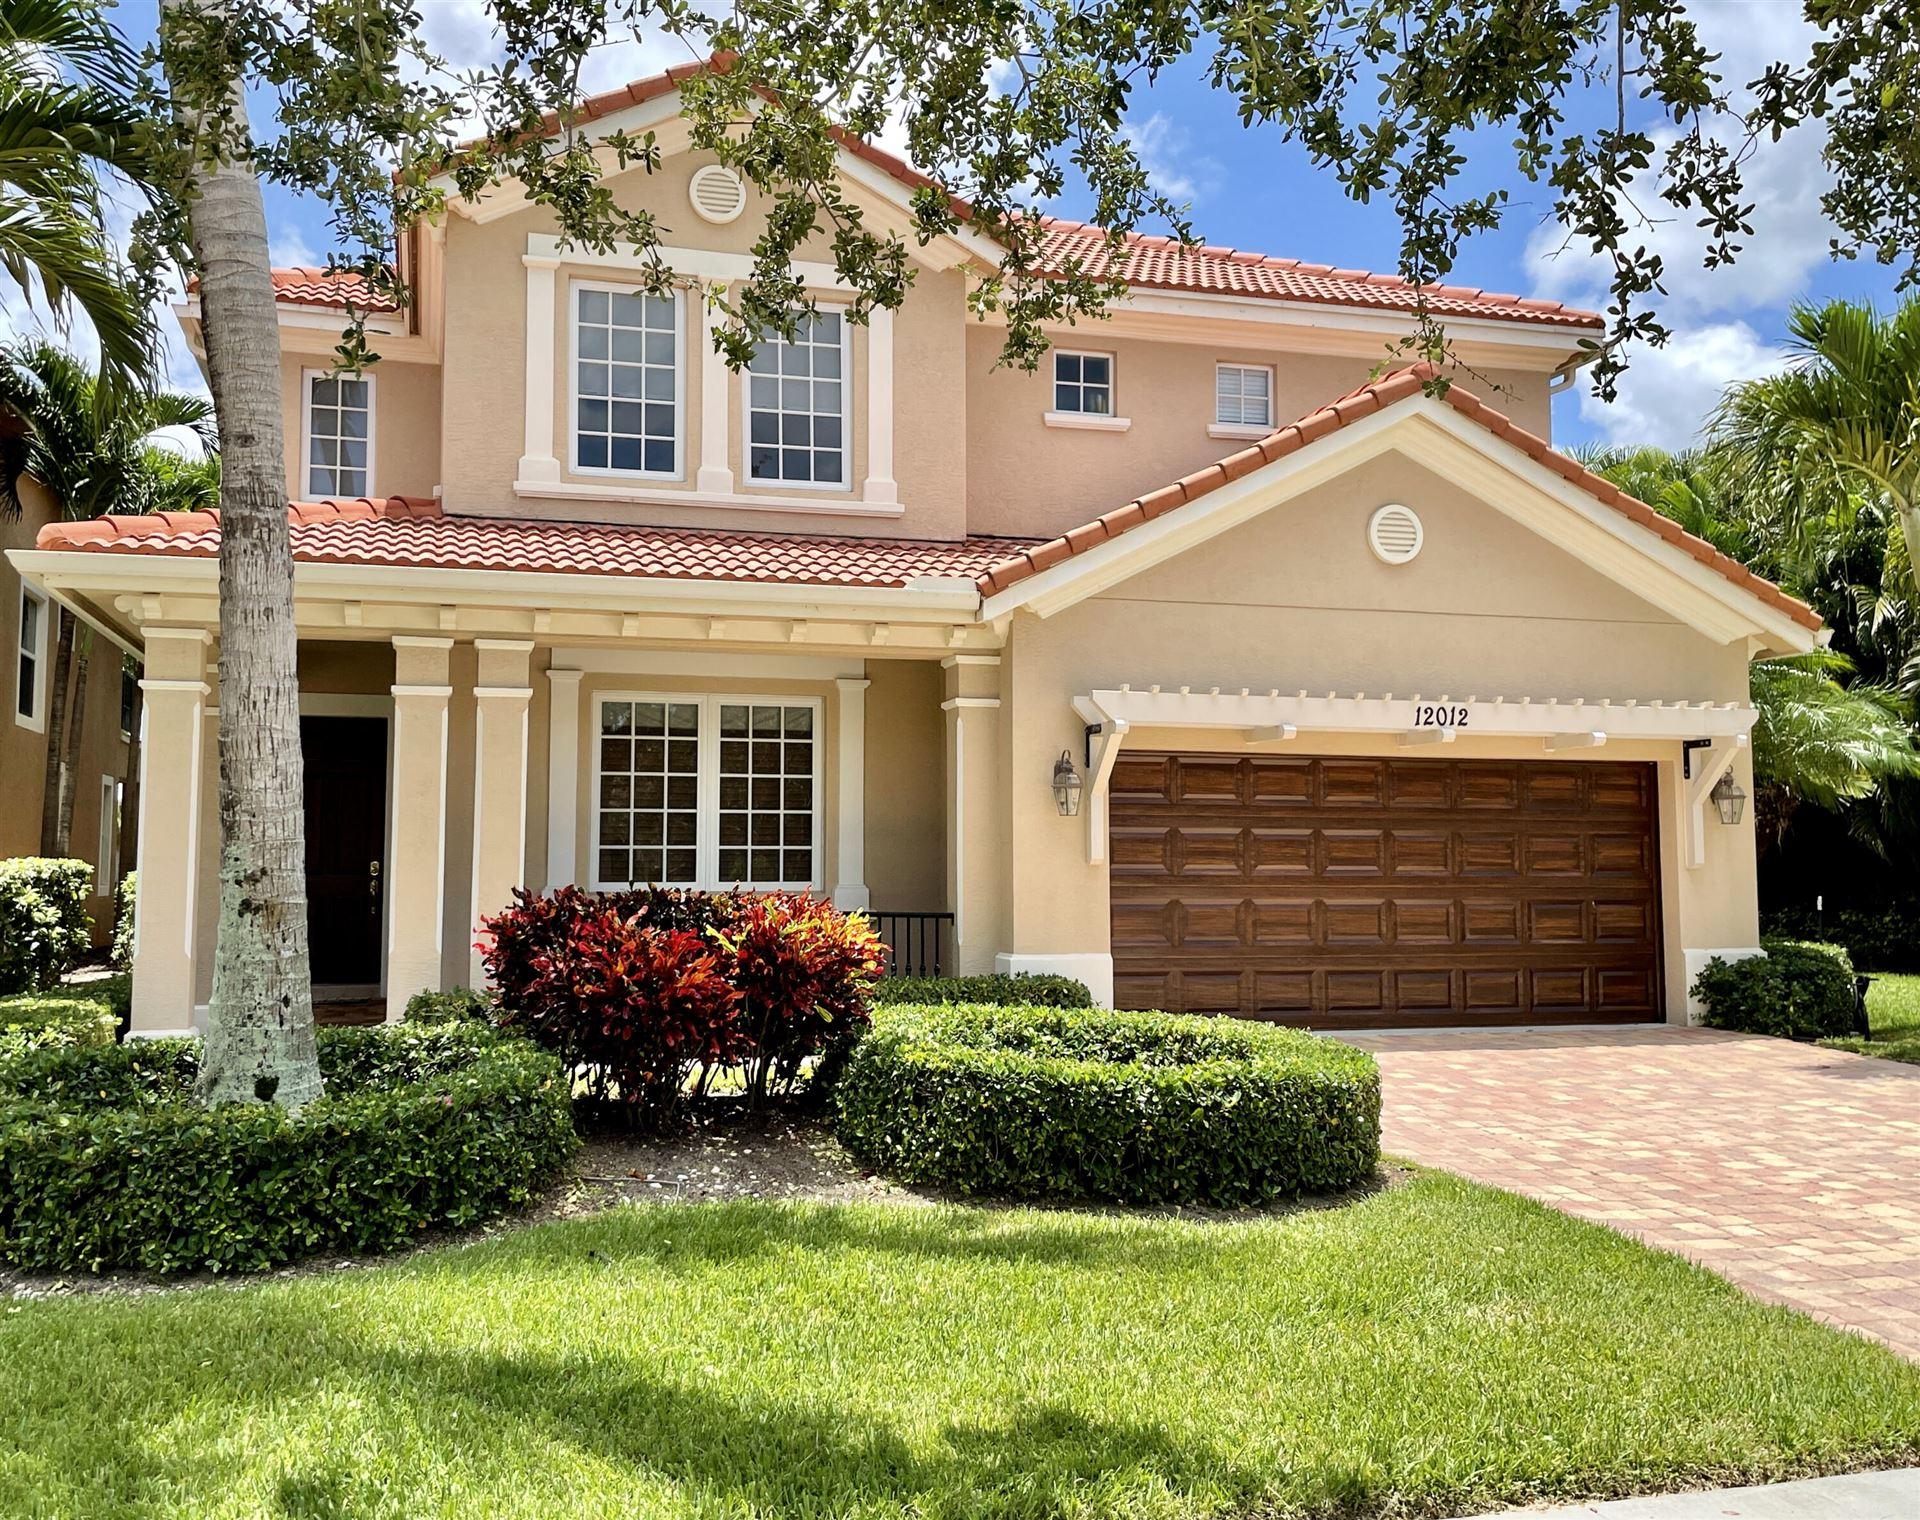 12012 Aviles Circle, Palm Beach Gardens, FL 33418 - MLS#: RX-10730267